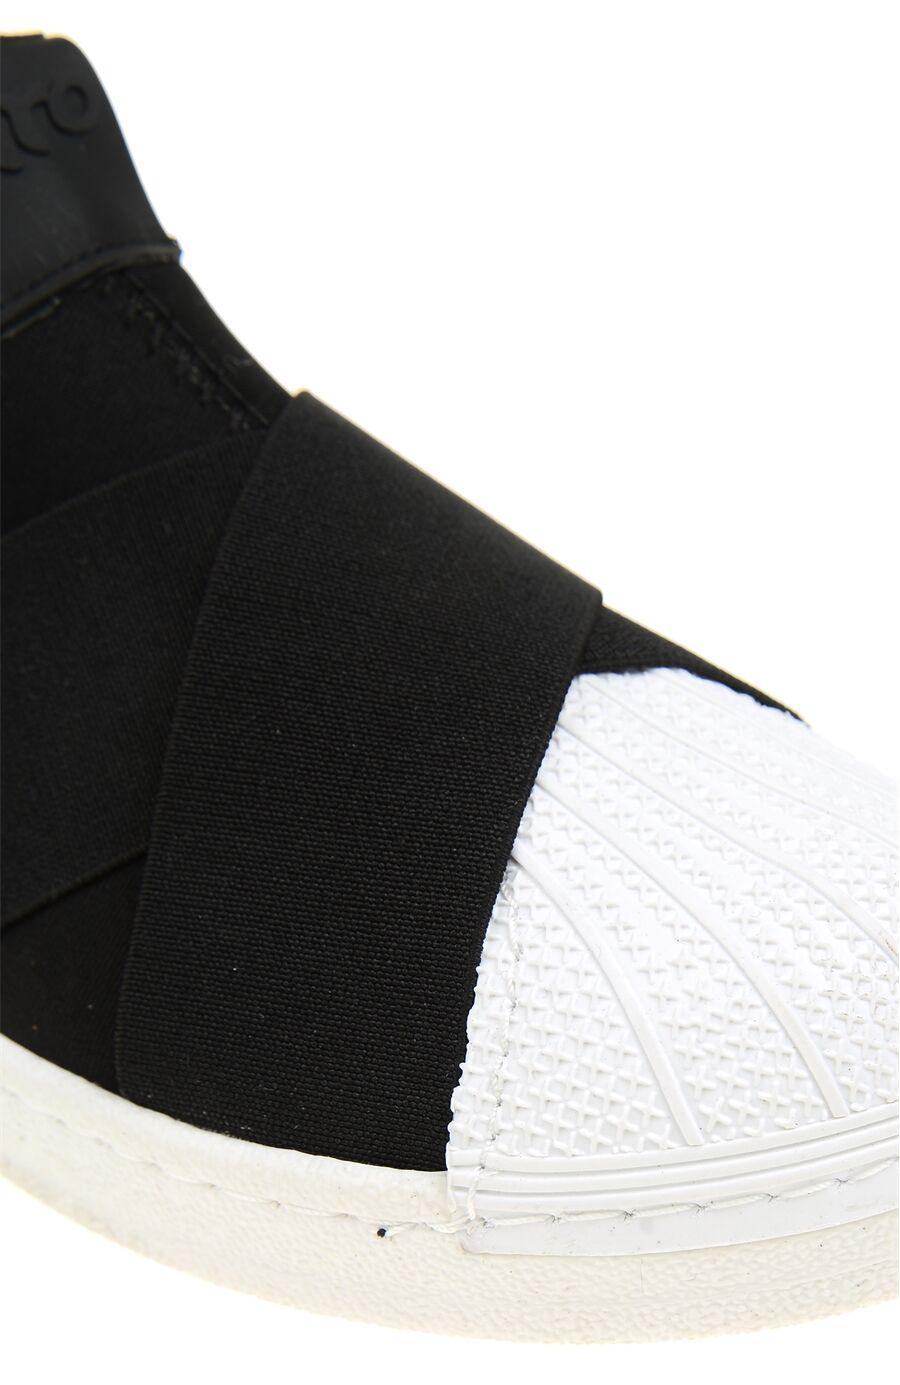 Lastik Detaylı Siyah Sneaker